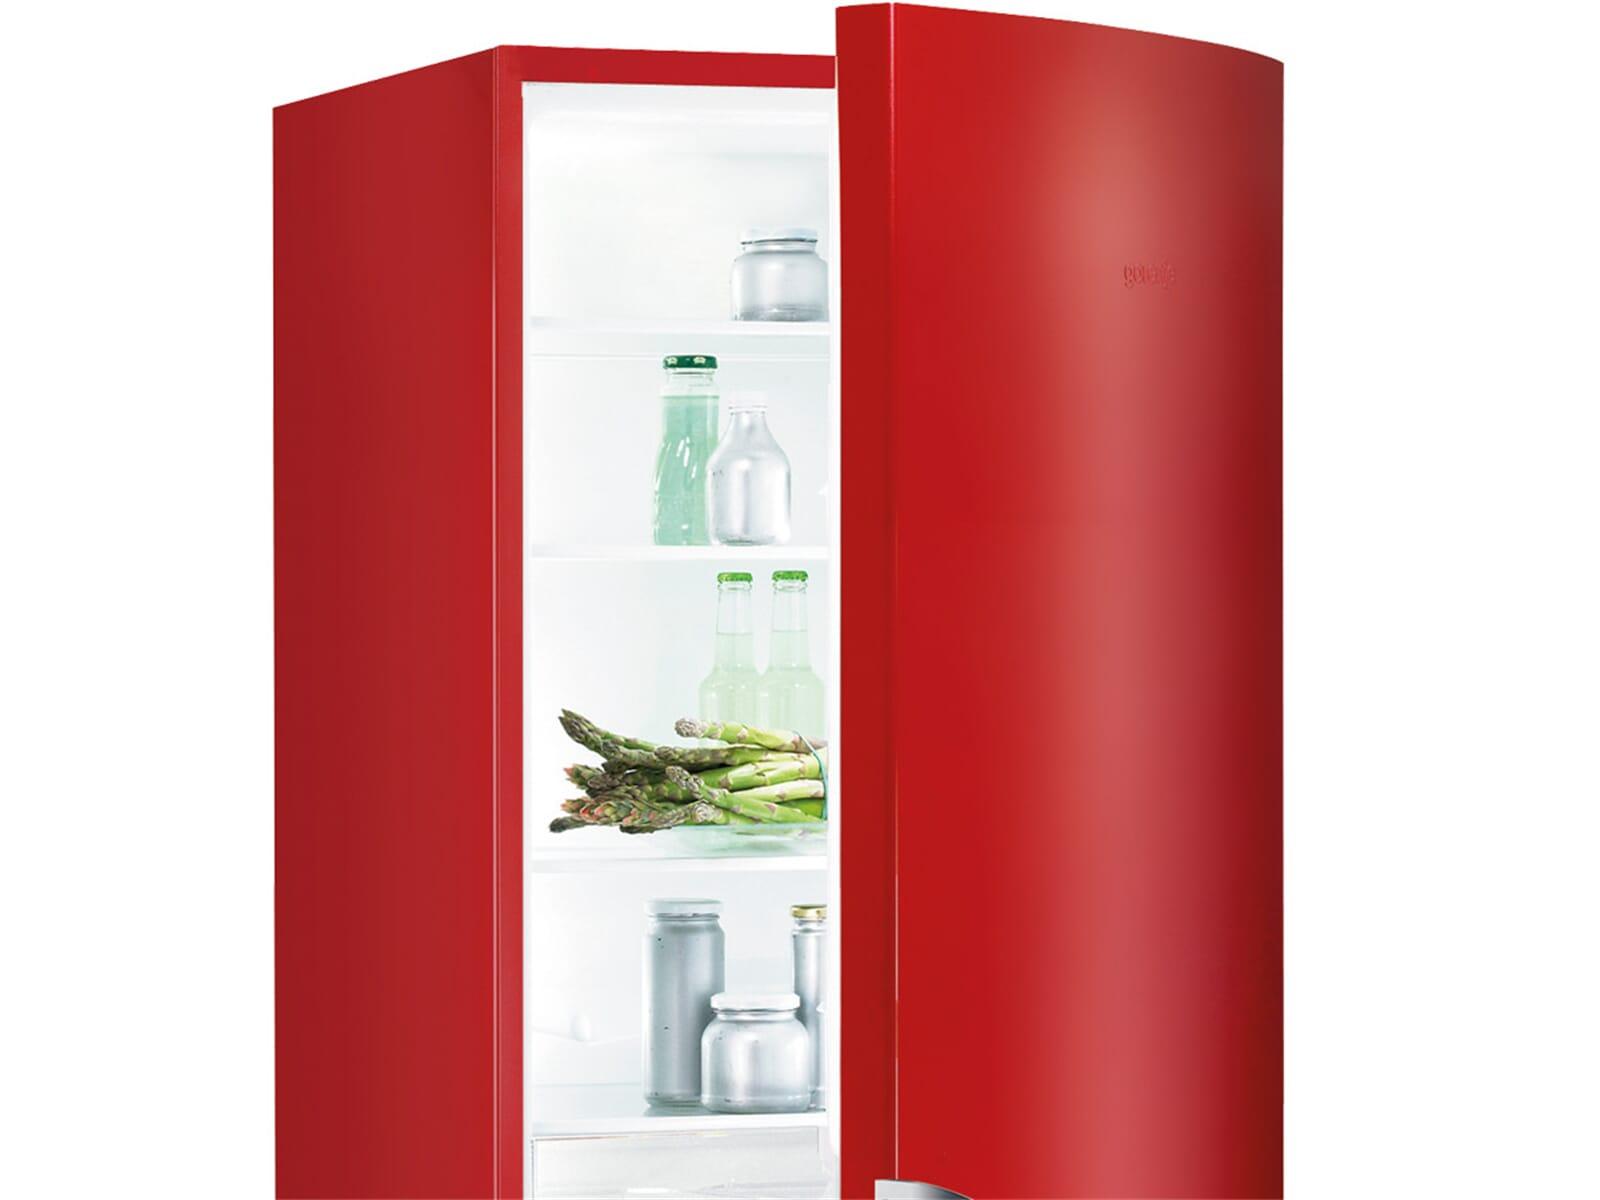 Retro Kühlschrank Notebooksbilliger : Gorenje kühlschrank gefrierkombination kühl gefrierkombination